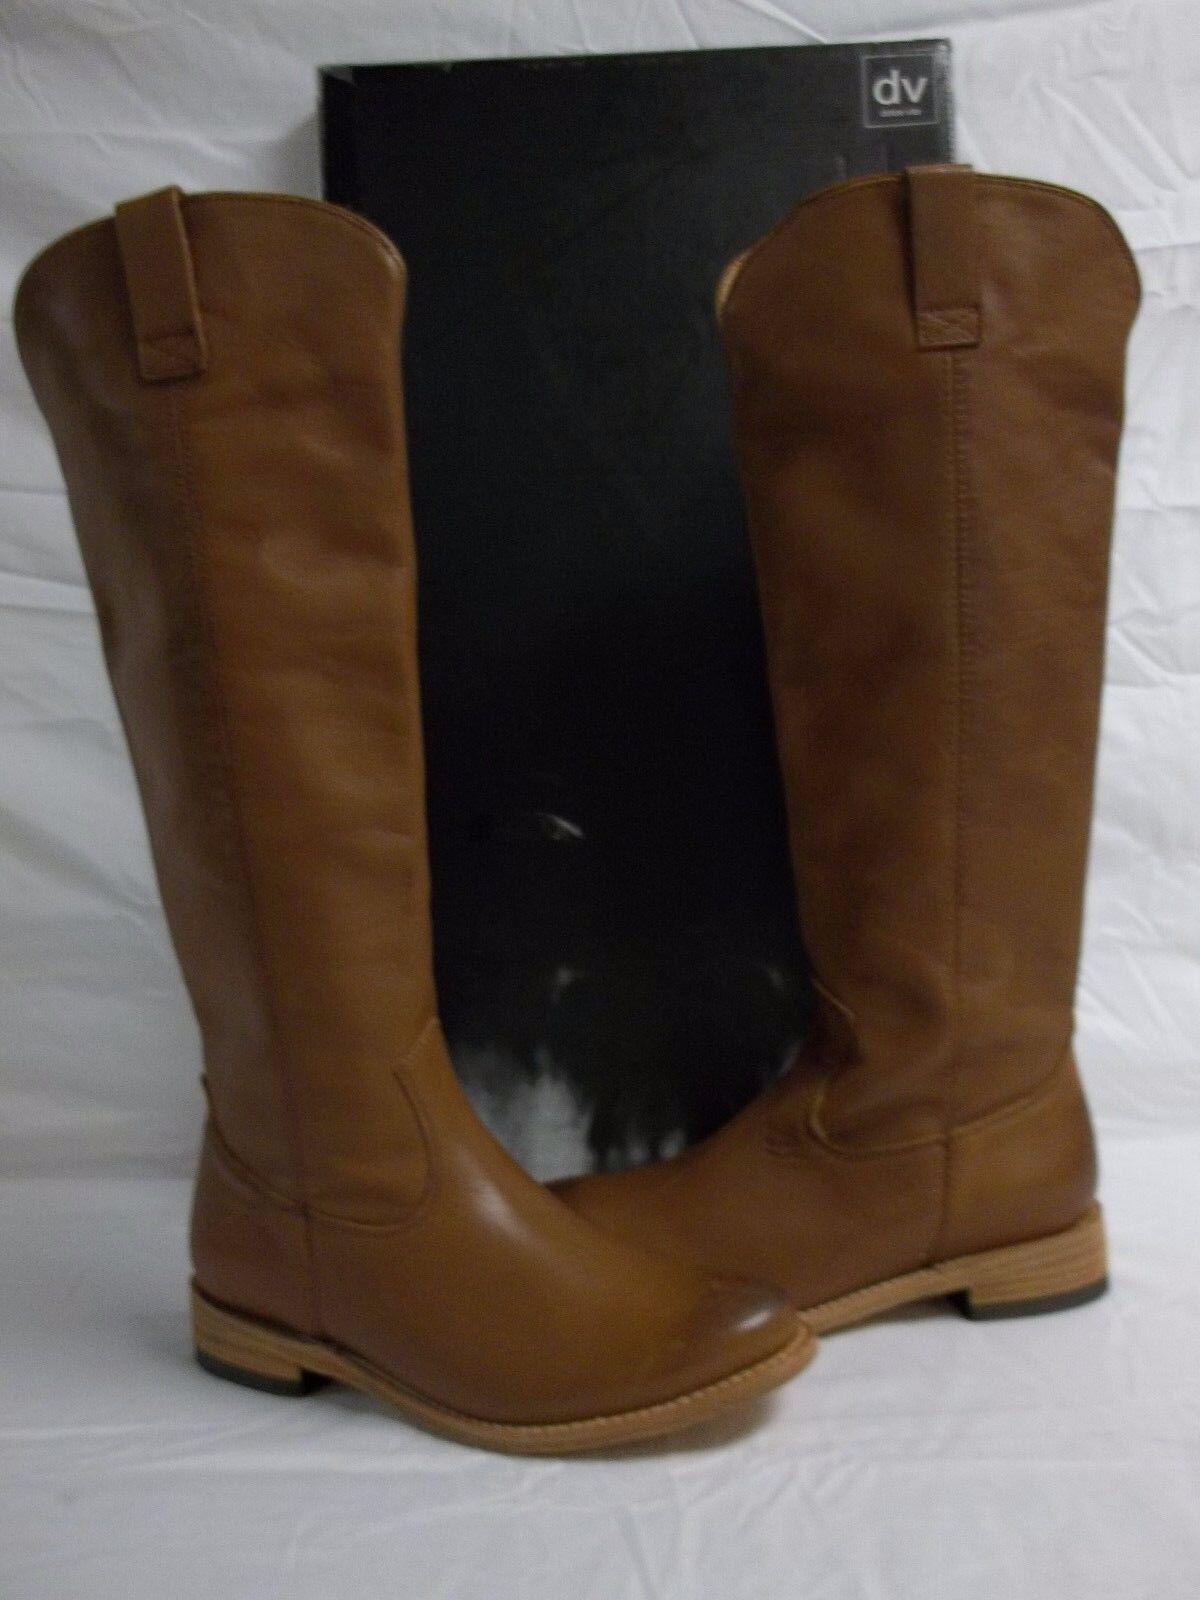 Dolce Vita Größe 6.5 M New Lujan Cognac Leder Knee High Stiefel New M Damenschuhe Schuhes NWB 8ec2b8